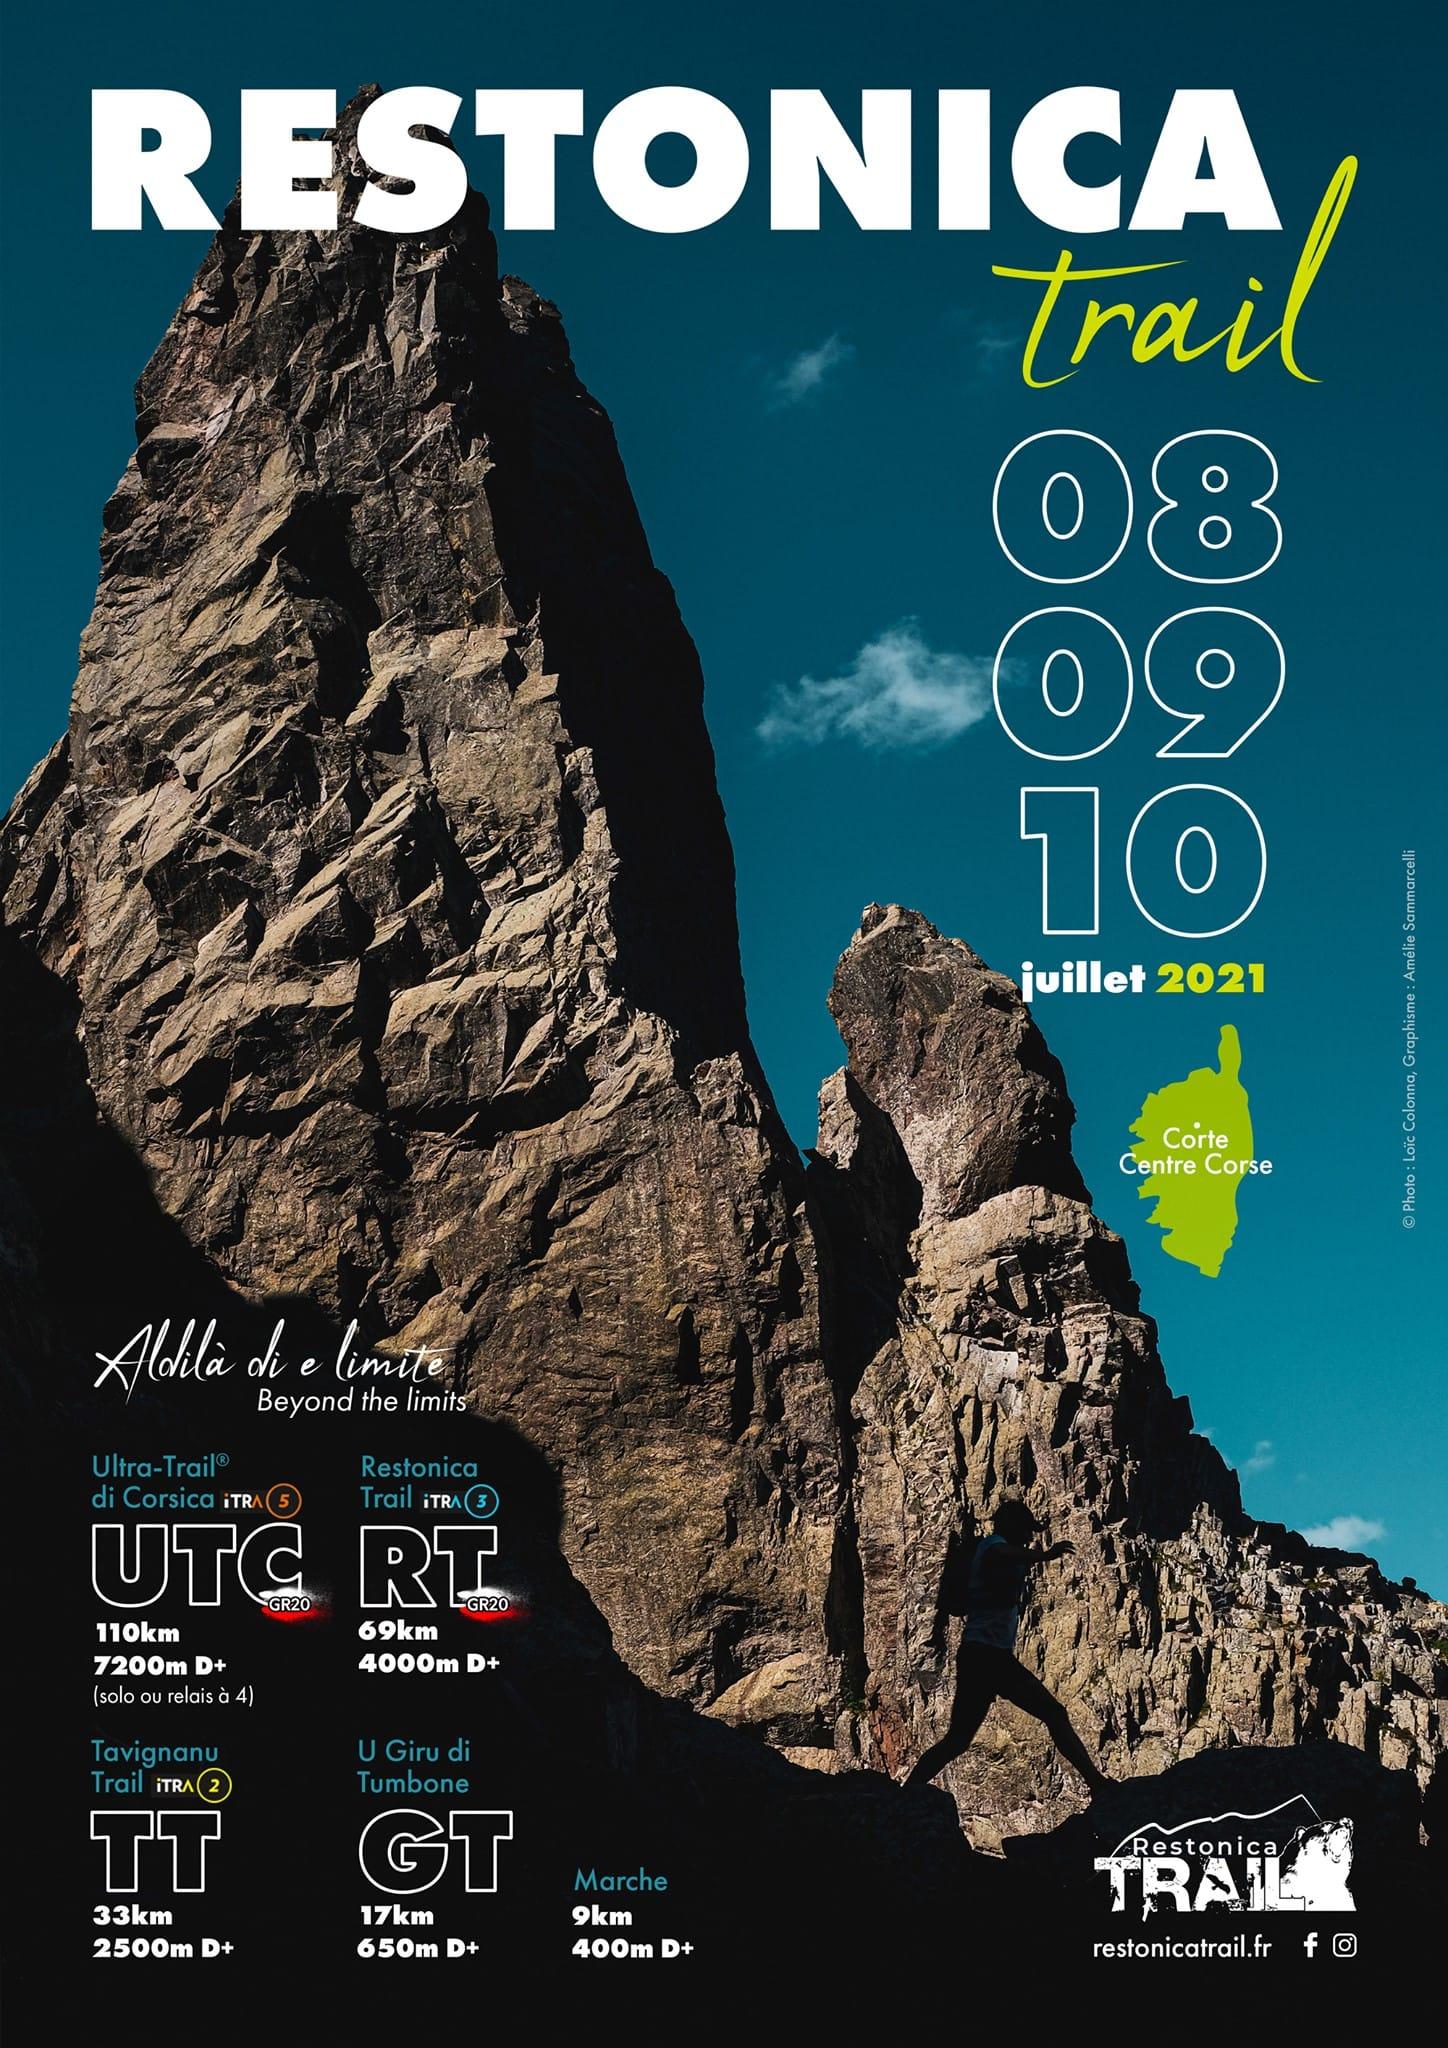 Restonica Trail 2021 | Trail Péi